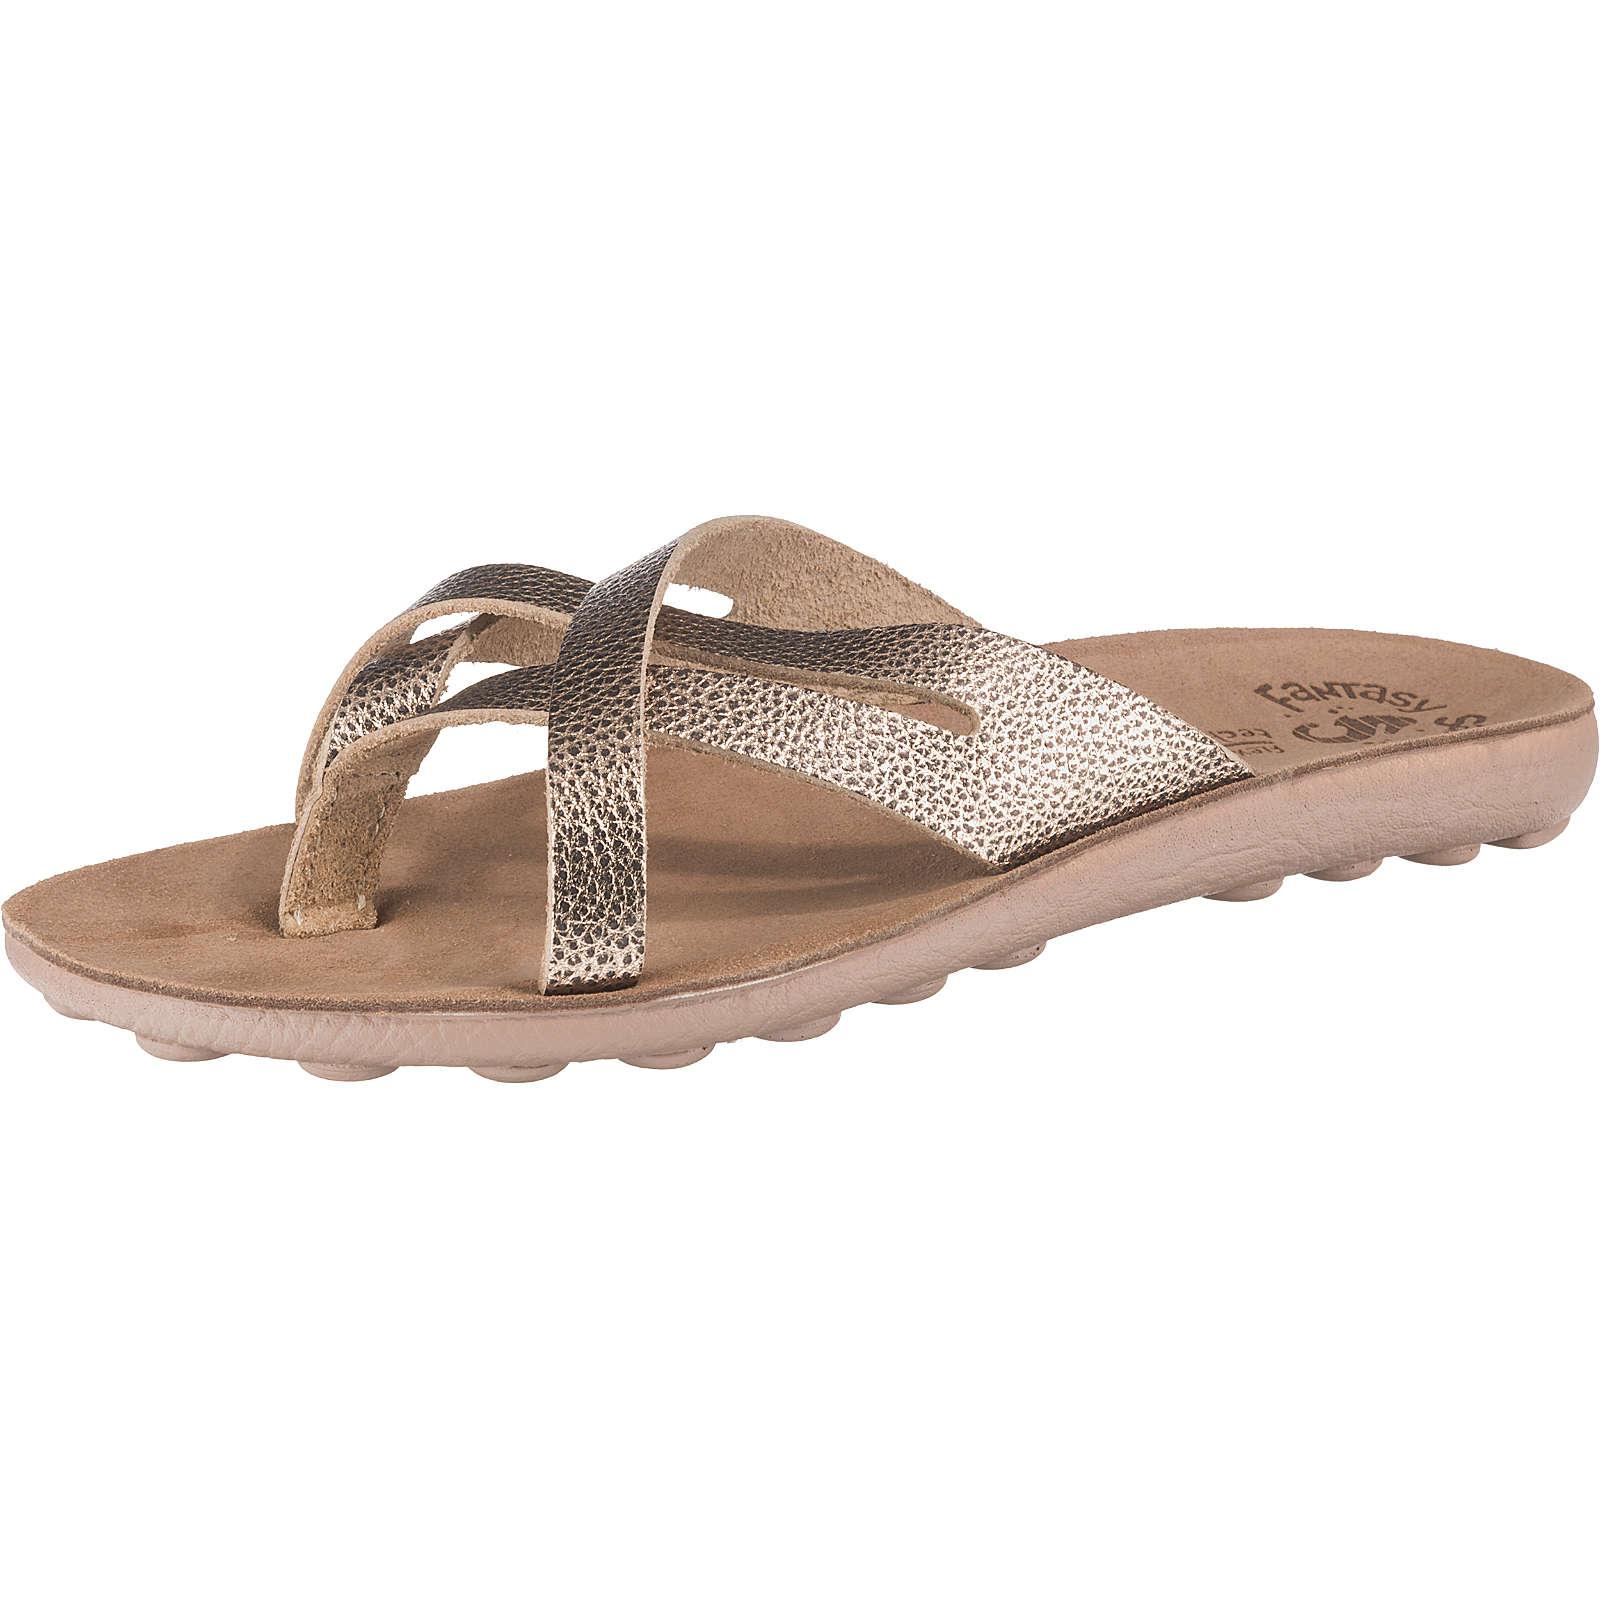 Fantasy Sandals Celeste Komfort-Pantoletten bronze Damen Gr. 38